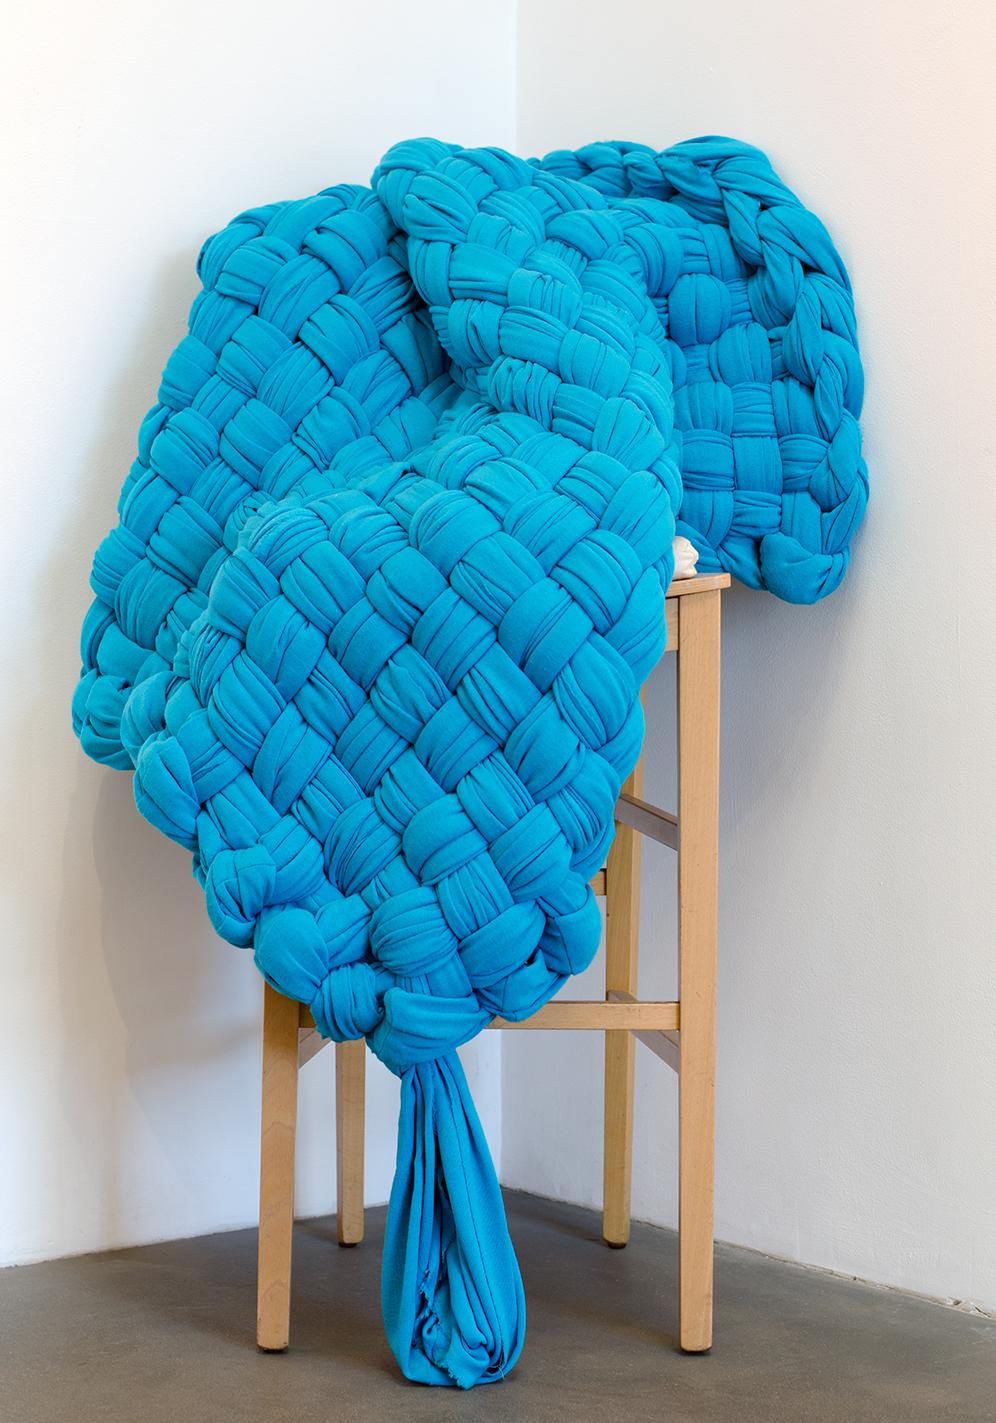 Blue Chenille,  2015 Cotton blend chenille 47 x 50 inches Unique